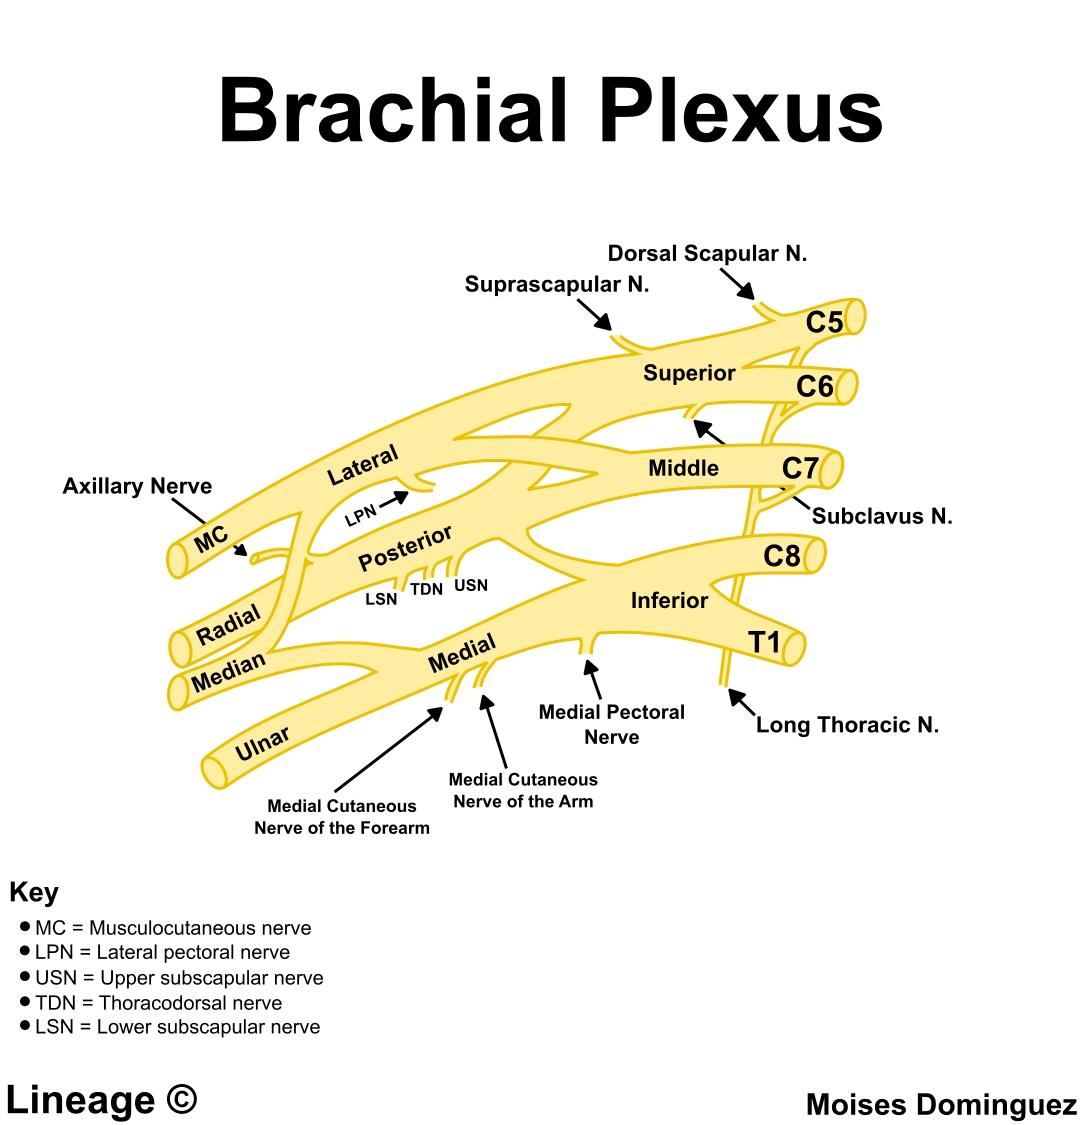 Brachial Plexus Anatomy Medbullets Step 1